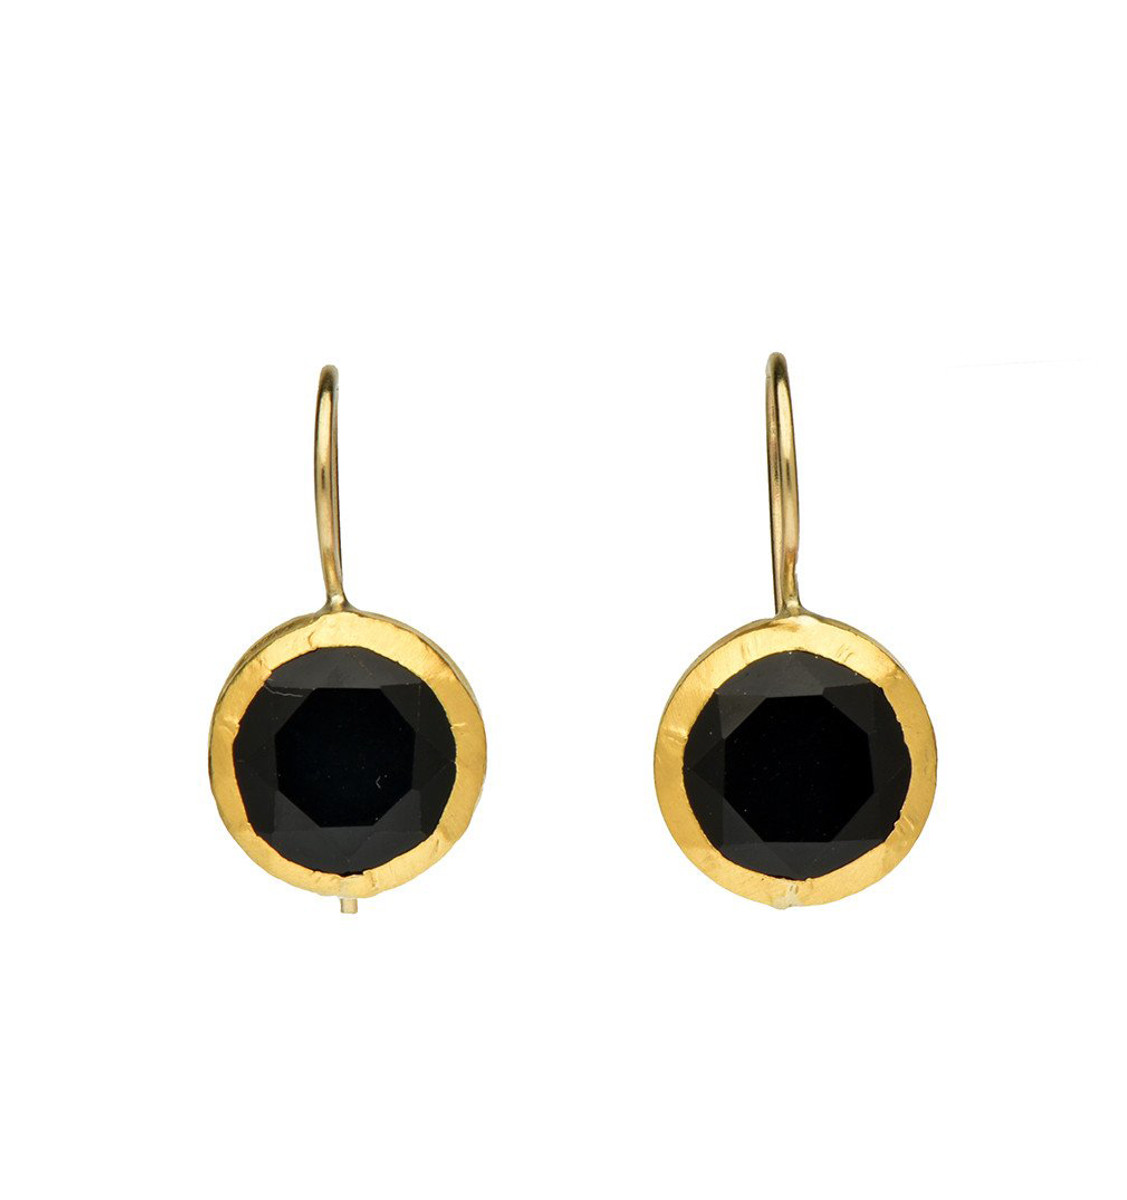 Back To Black Earrings - New Arrival